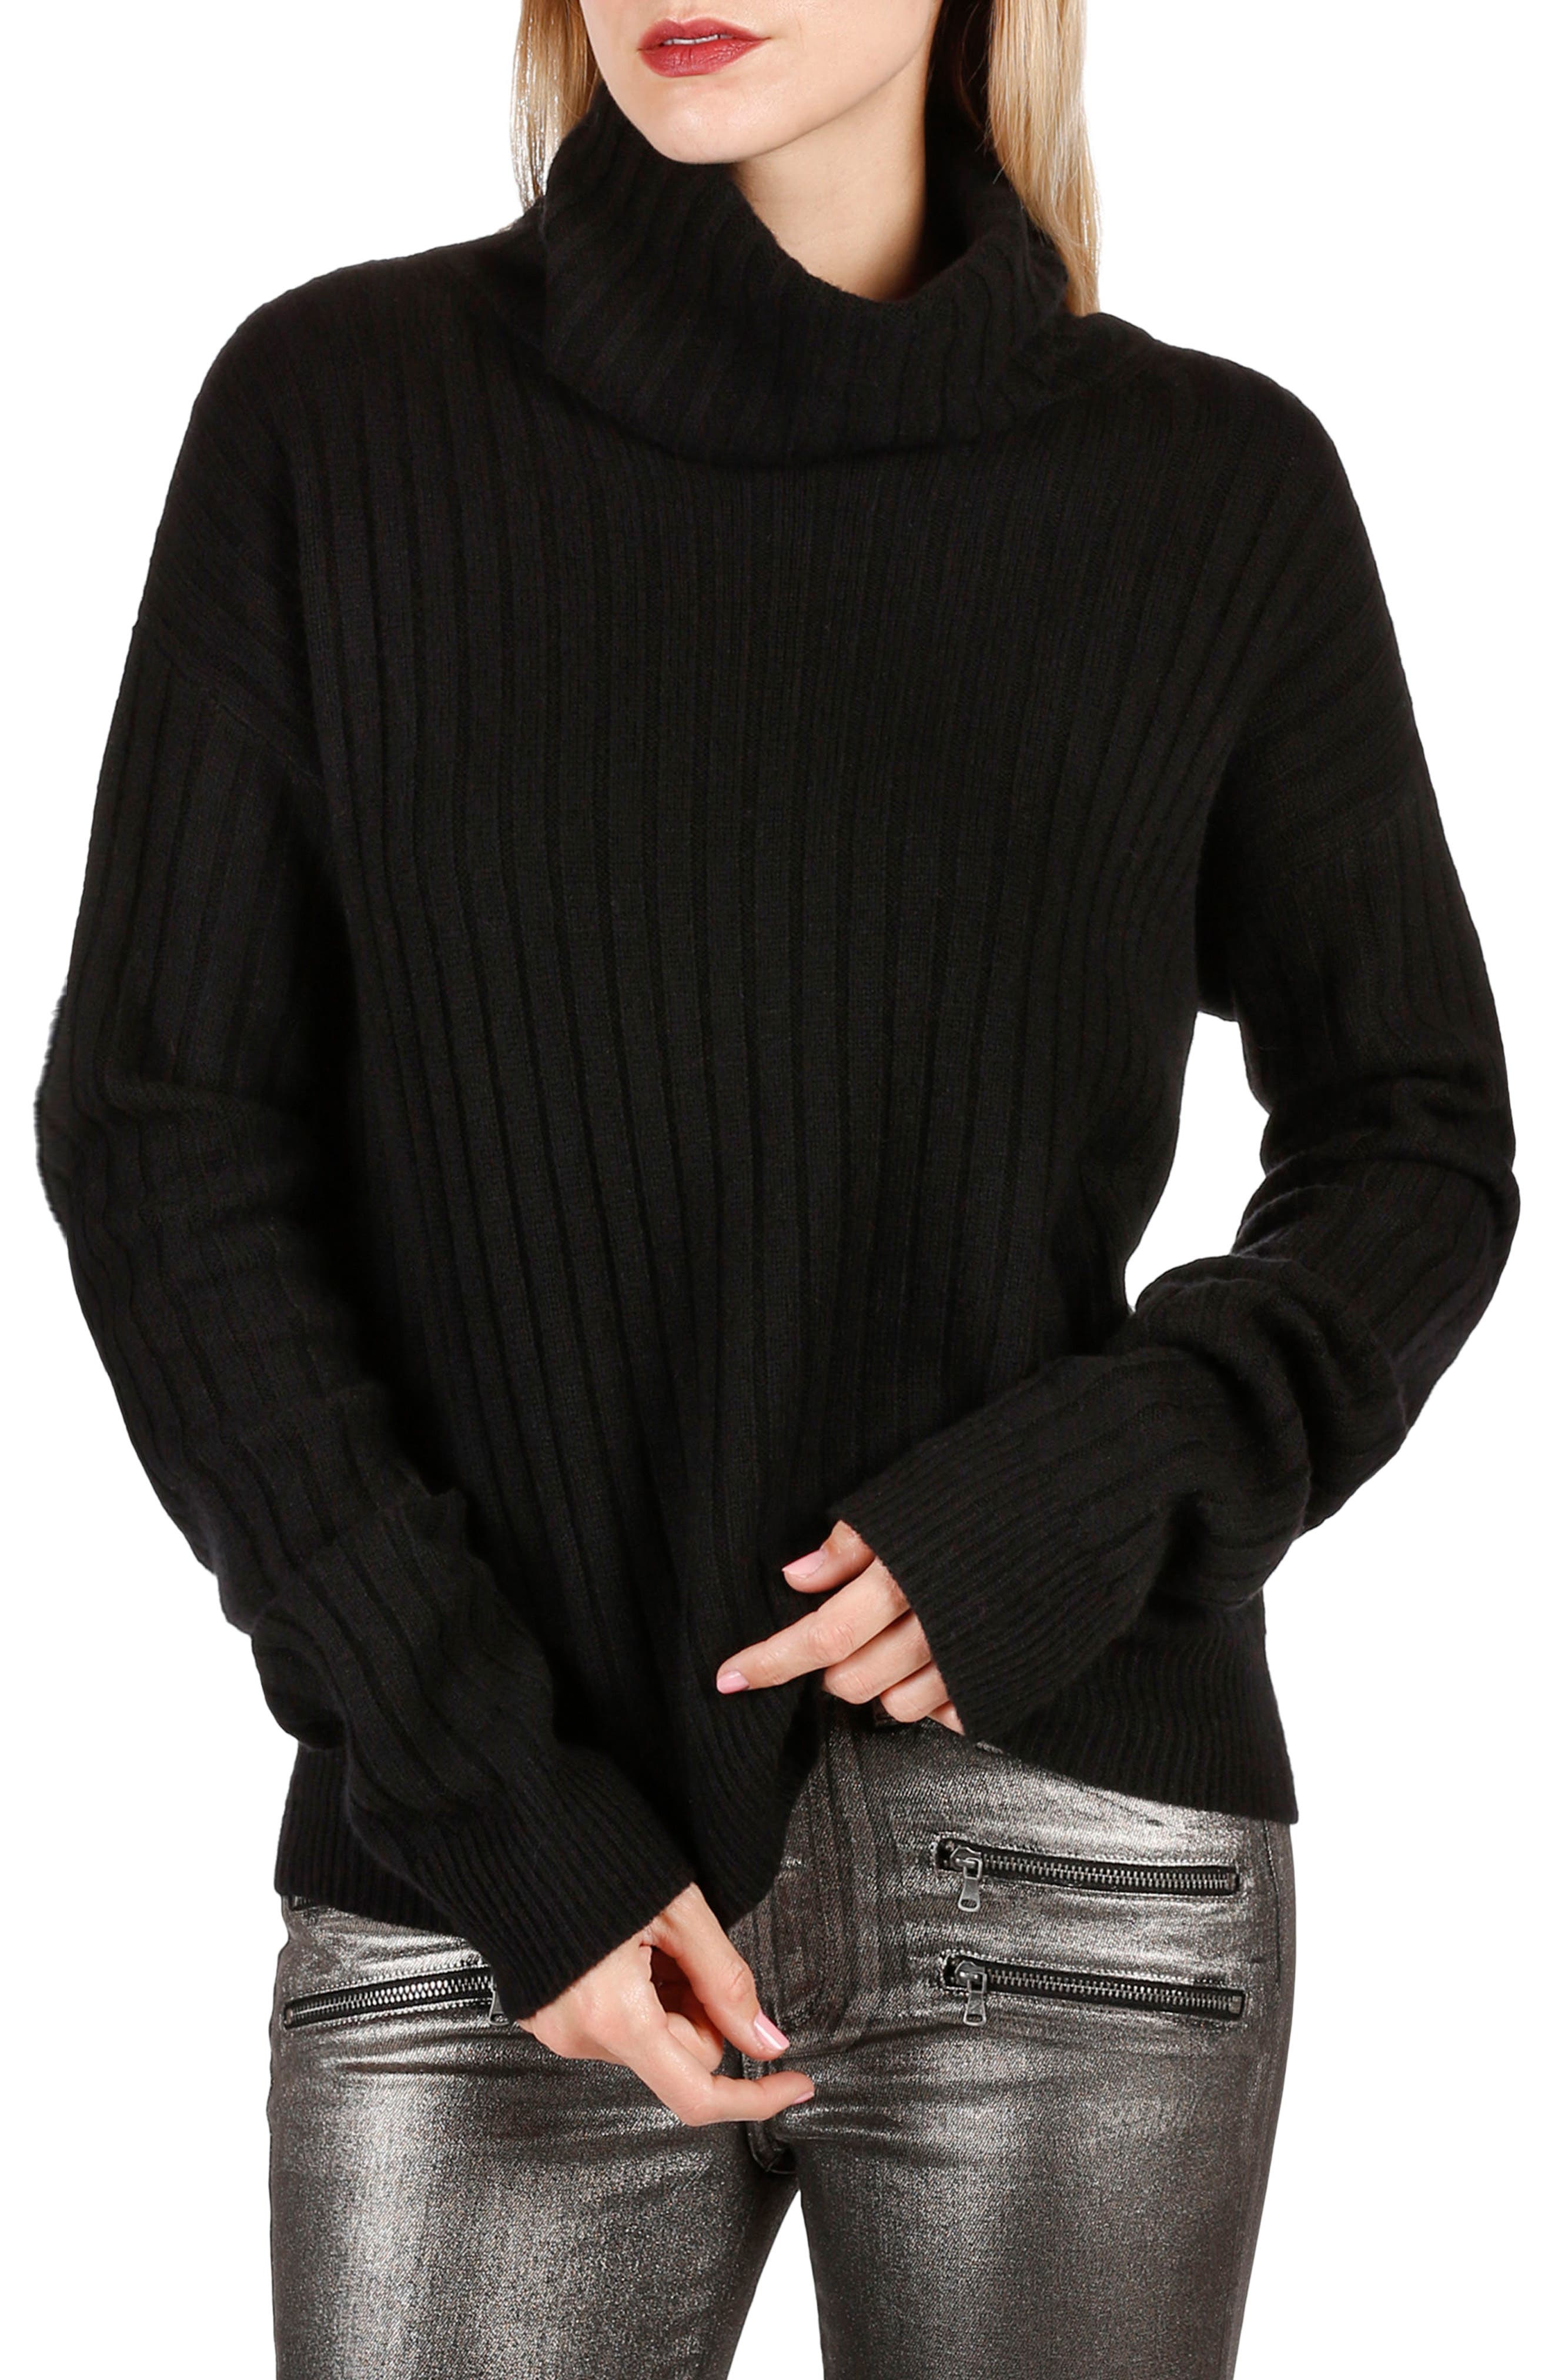 Main Image - Rosie HW x PAIGE Mina Turtleneck Sweater